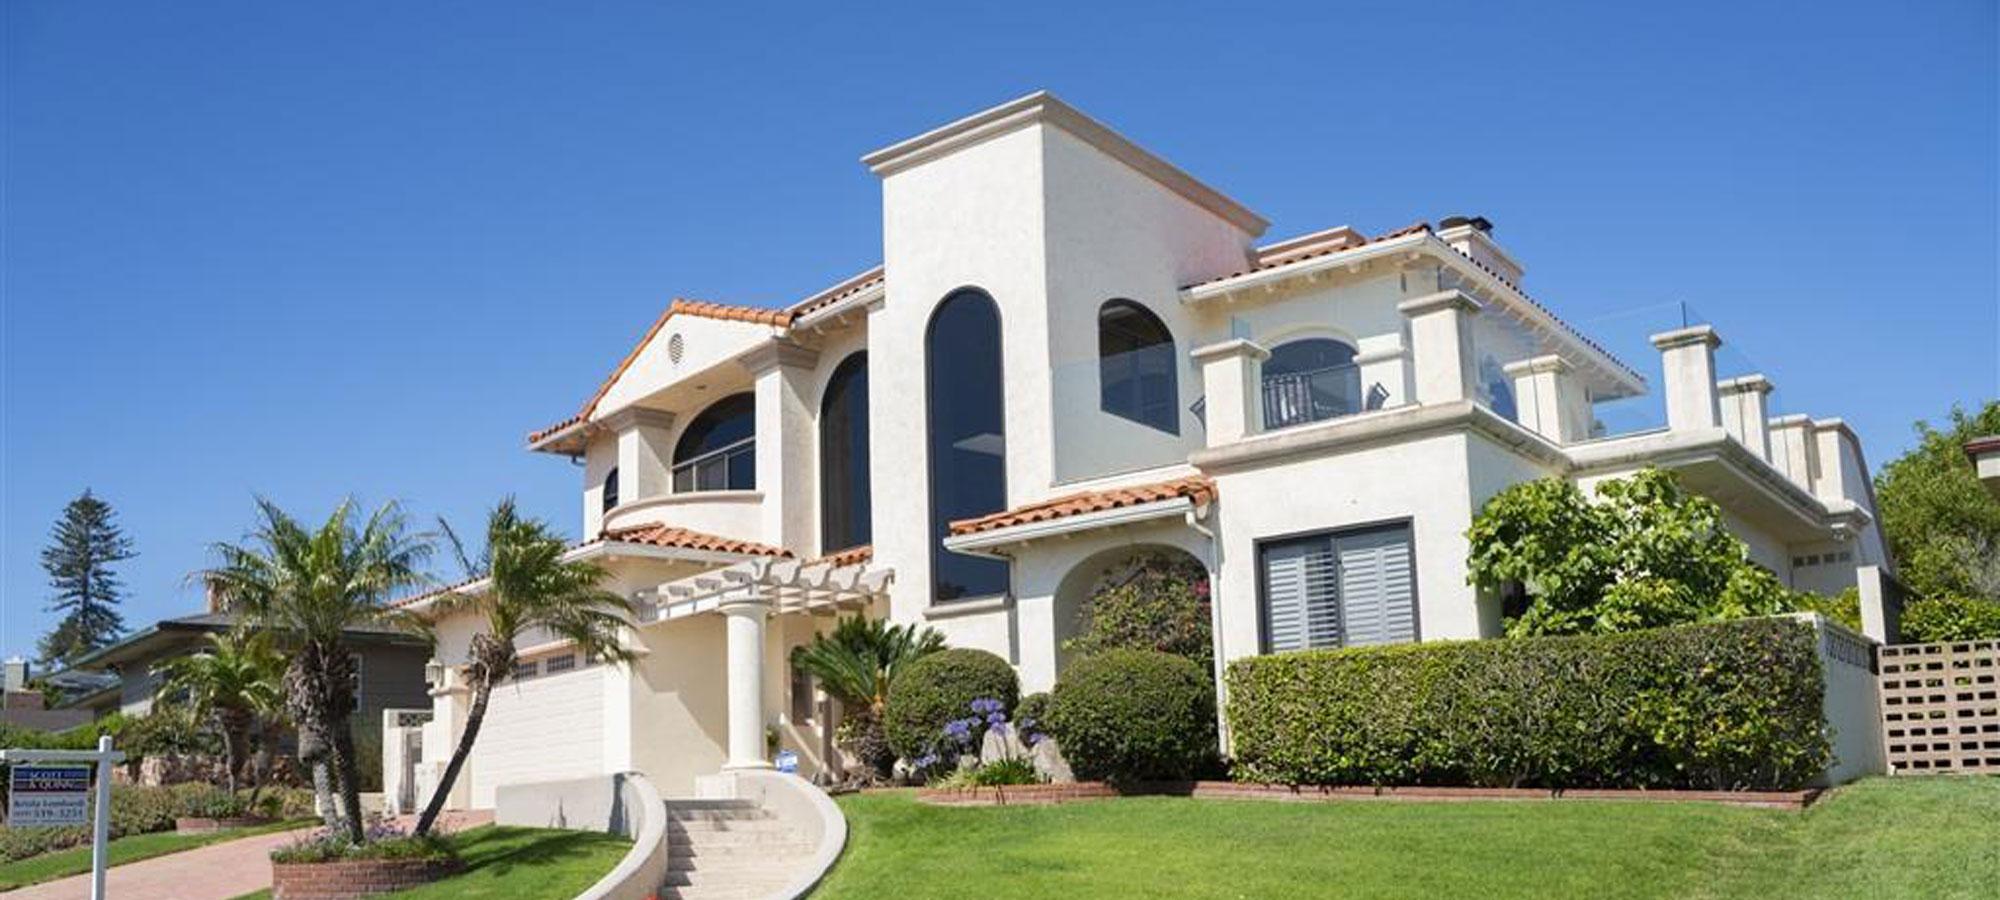 4021 Bandini San Diego, CA 92103